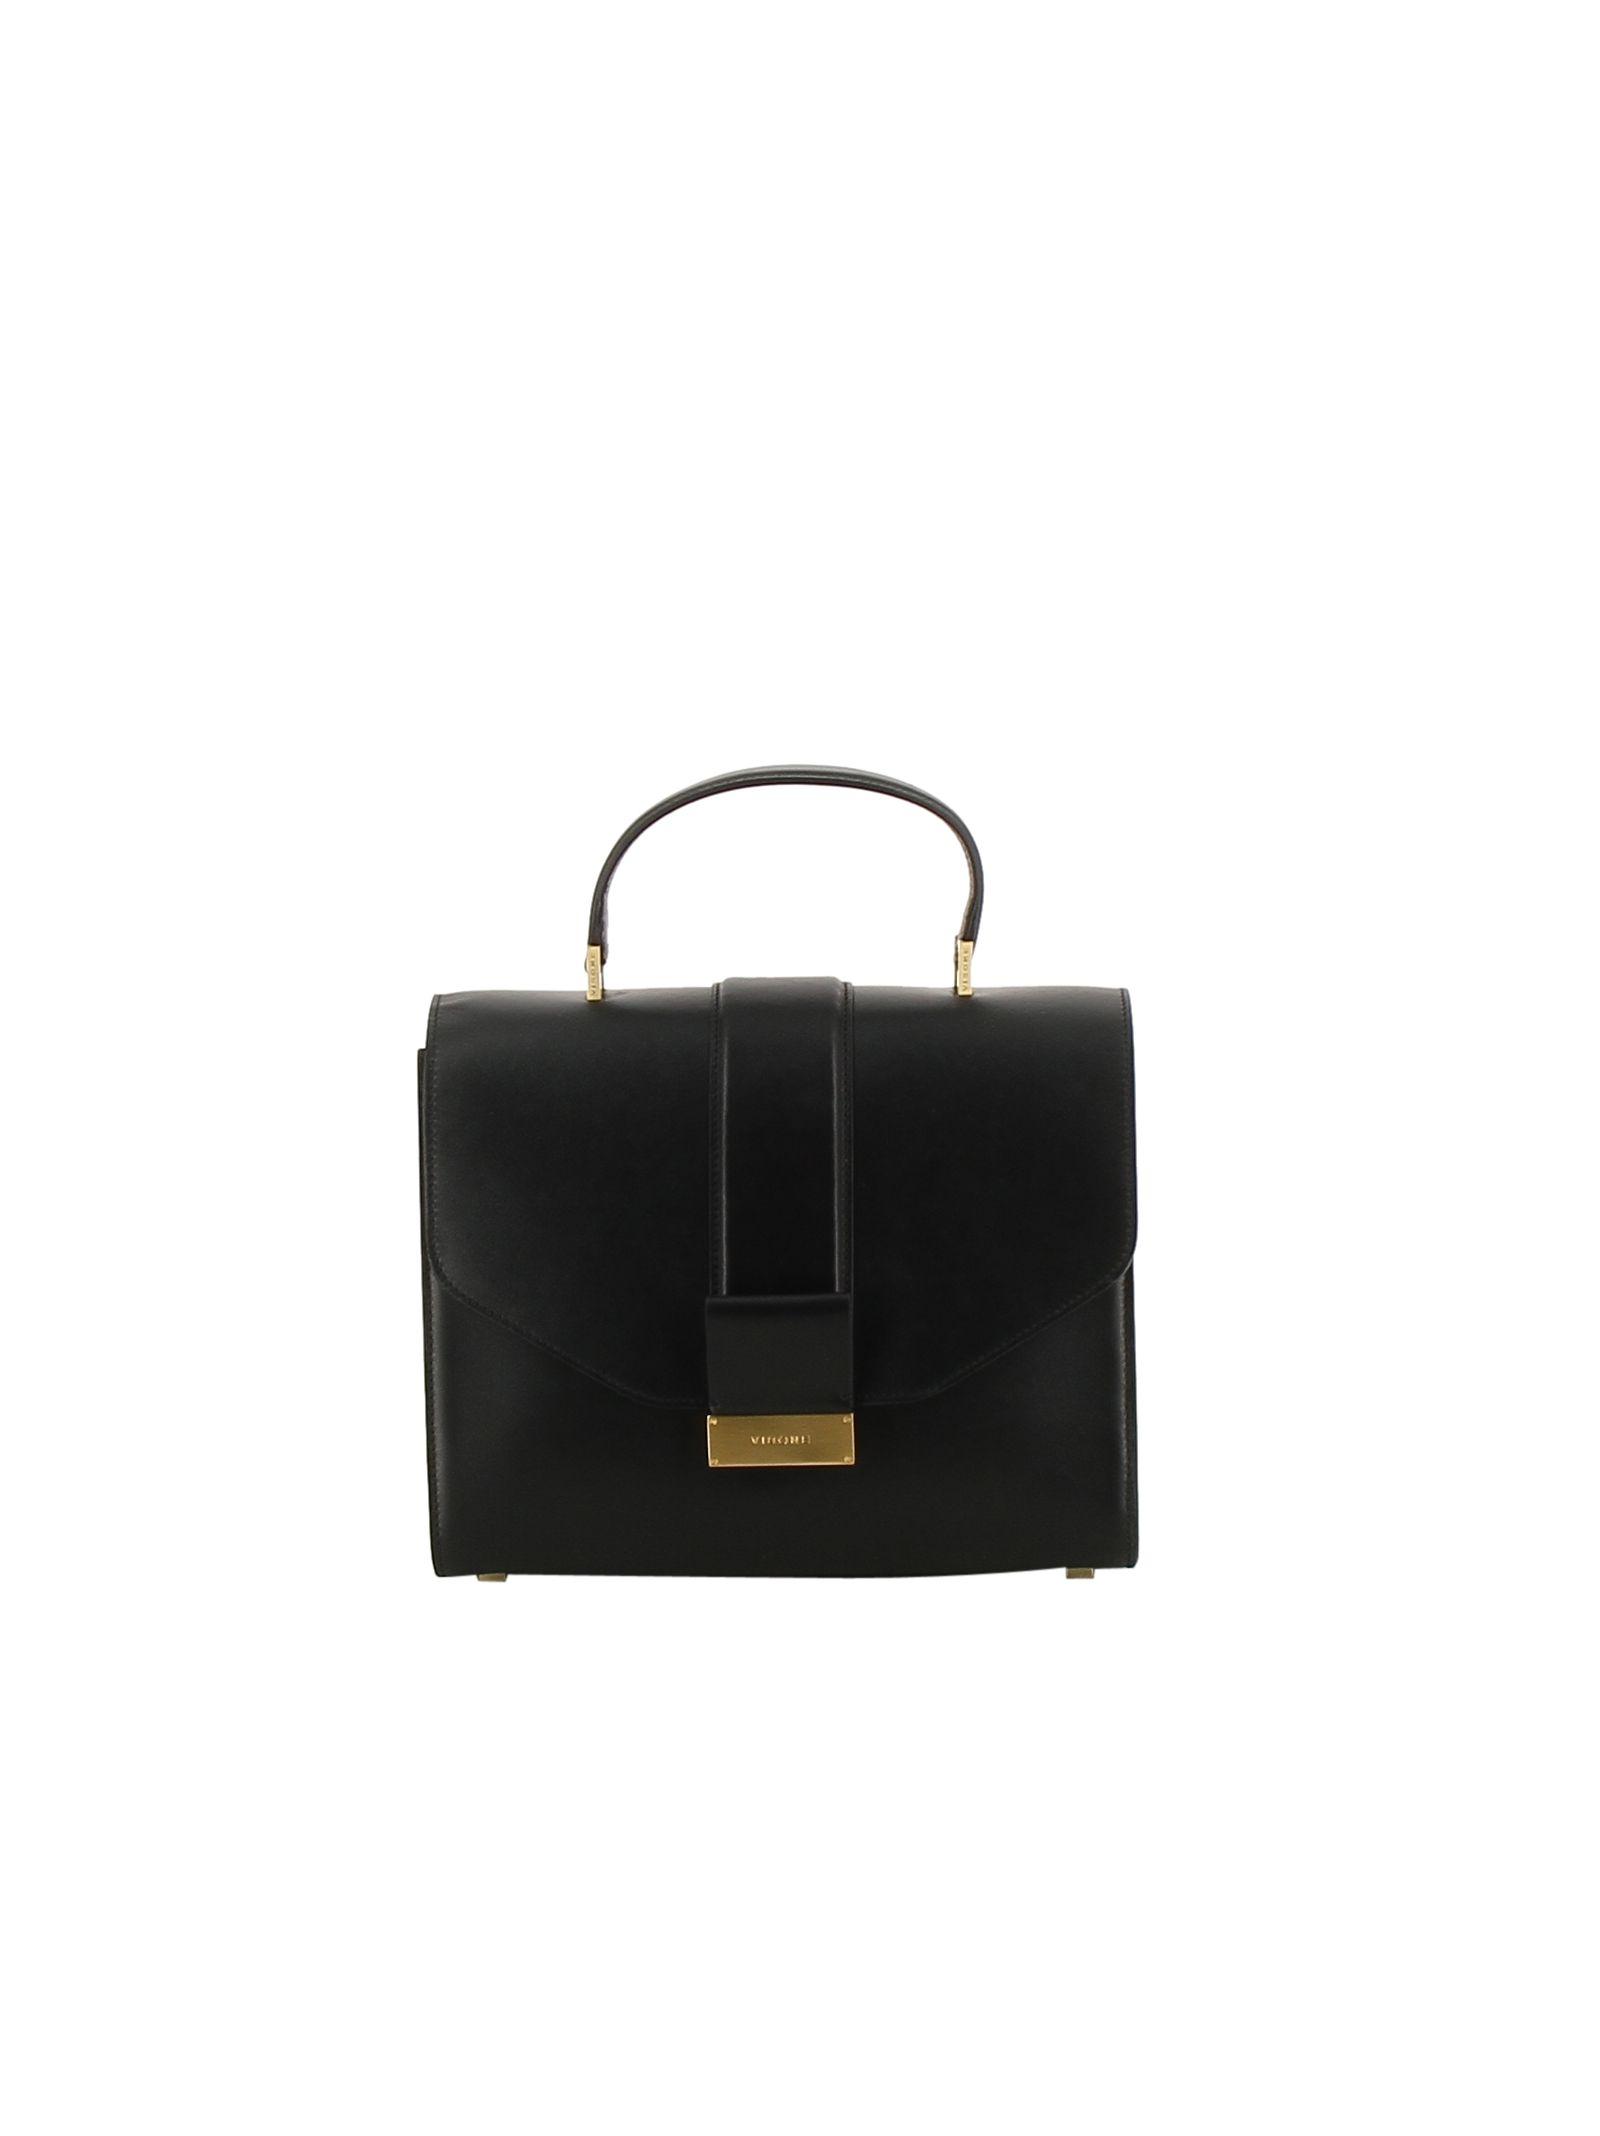 Angie medium tote bag - Black Visone gcRqVicb